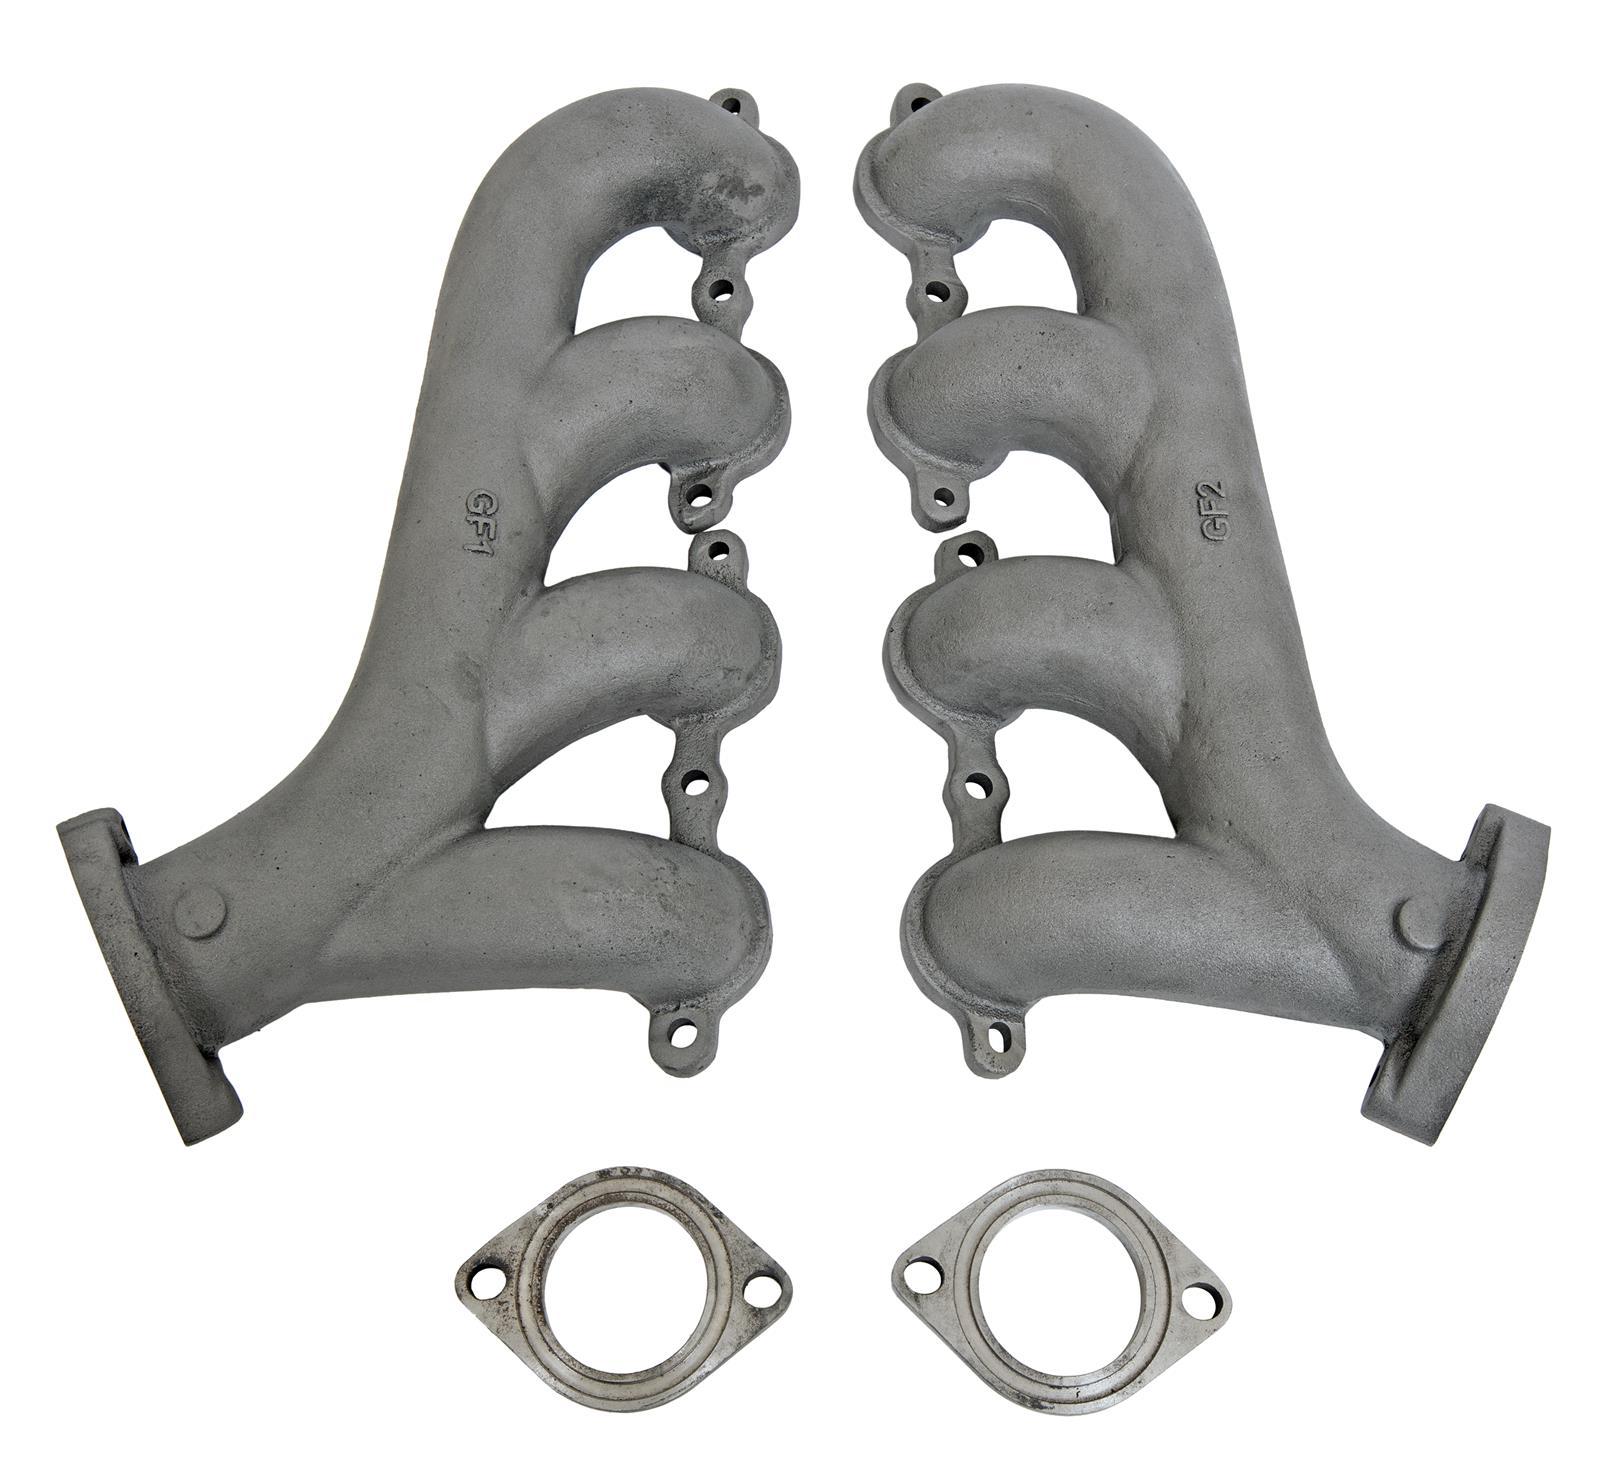 Summit Racing Chevy 4.8, 5.3, 5.7, 6.0, LS Swap Headers